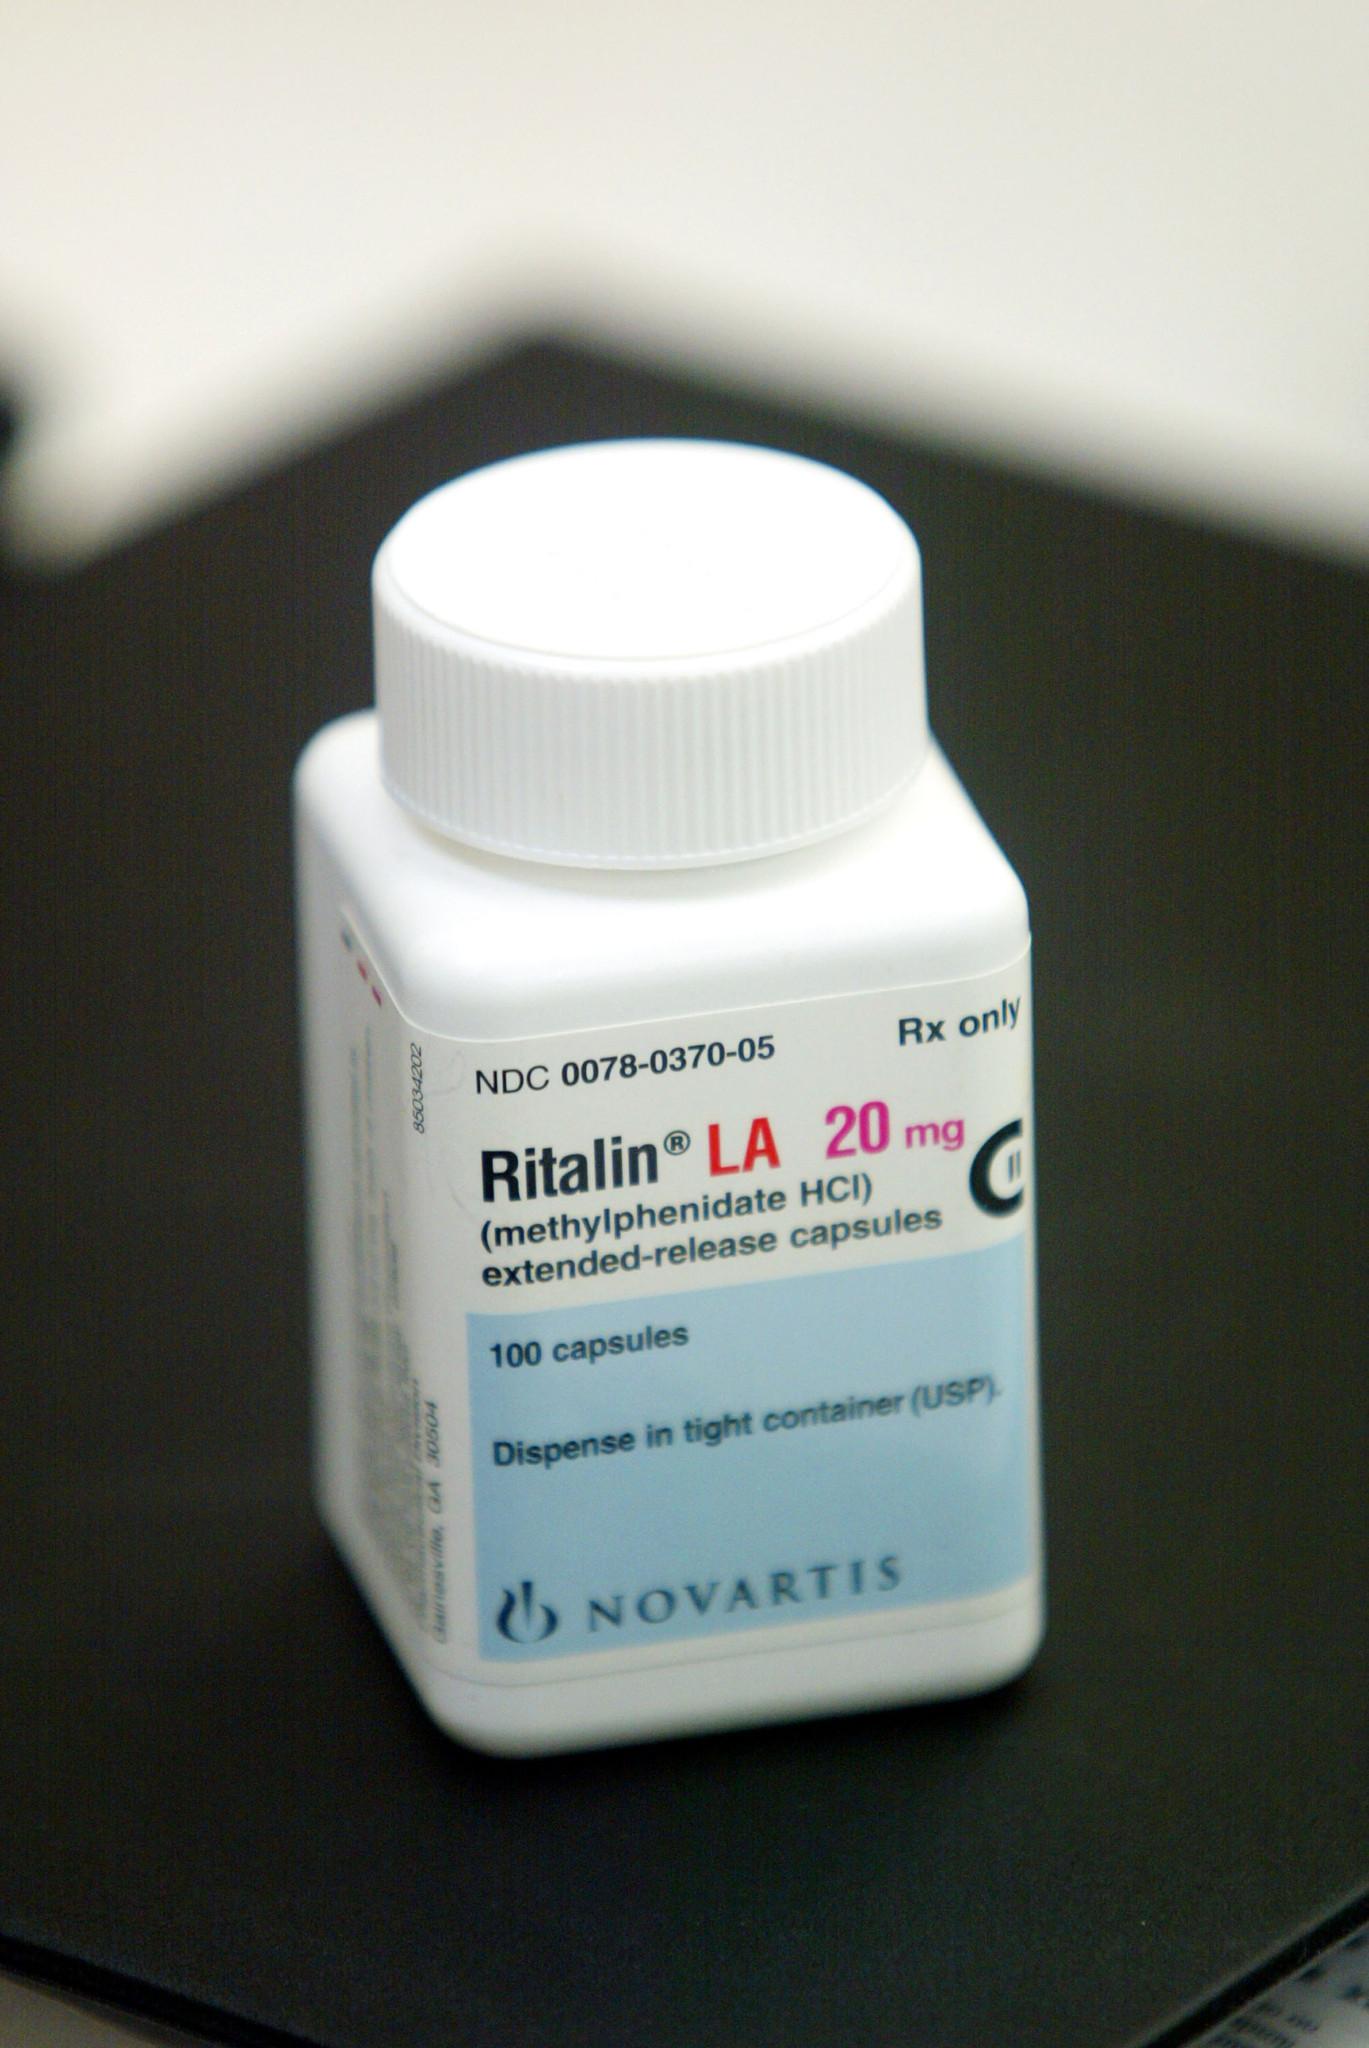 pentagon study links prescription stimulants to military